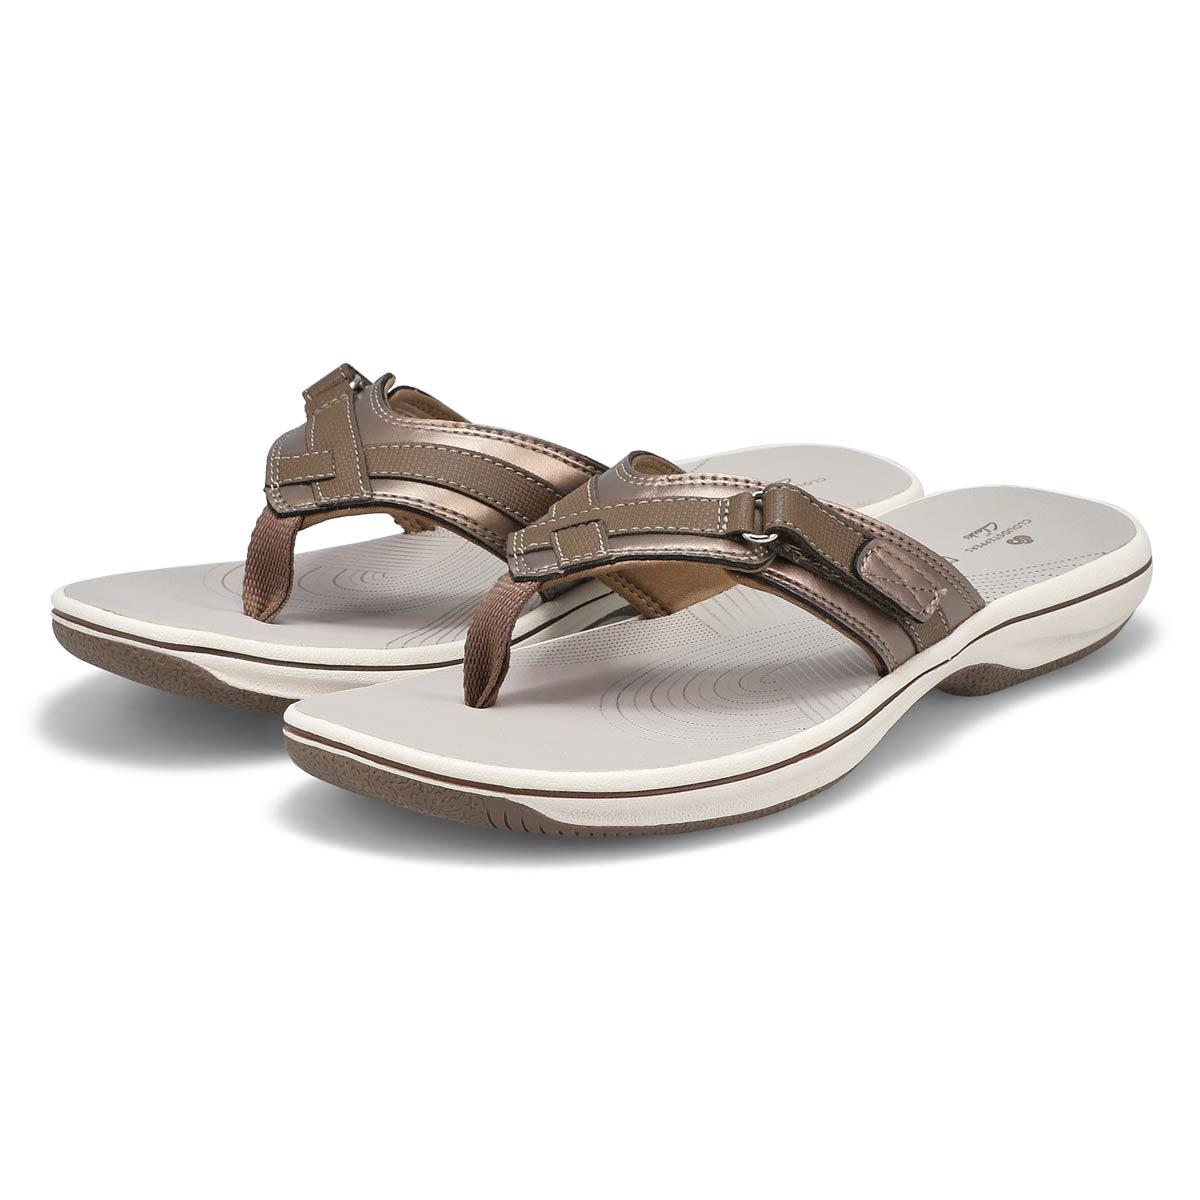 Lds Breeze Sea pewter thong sandal